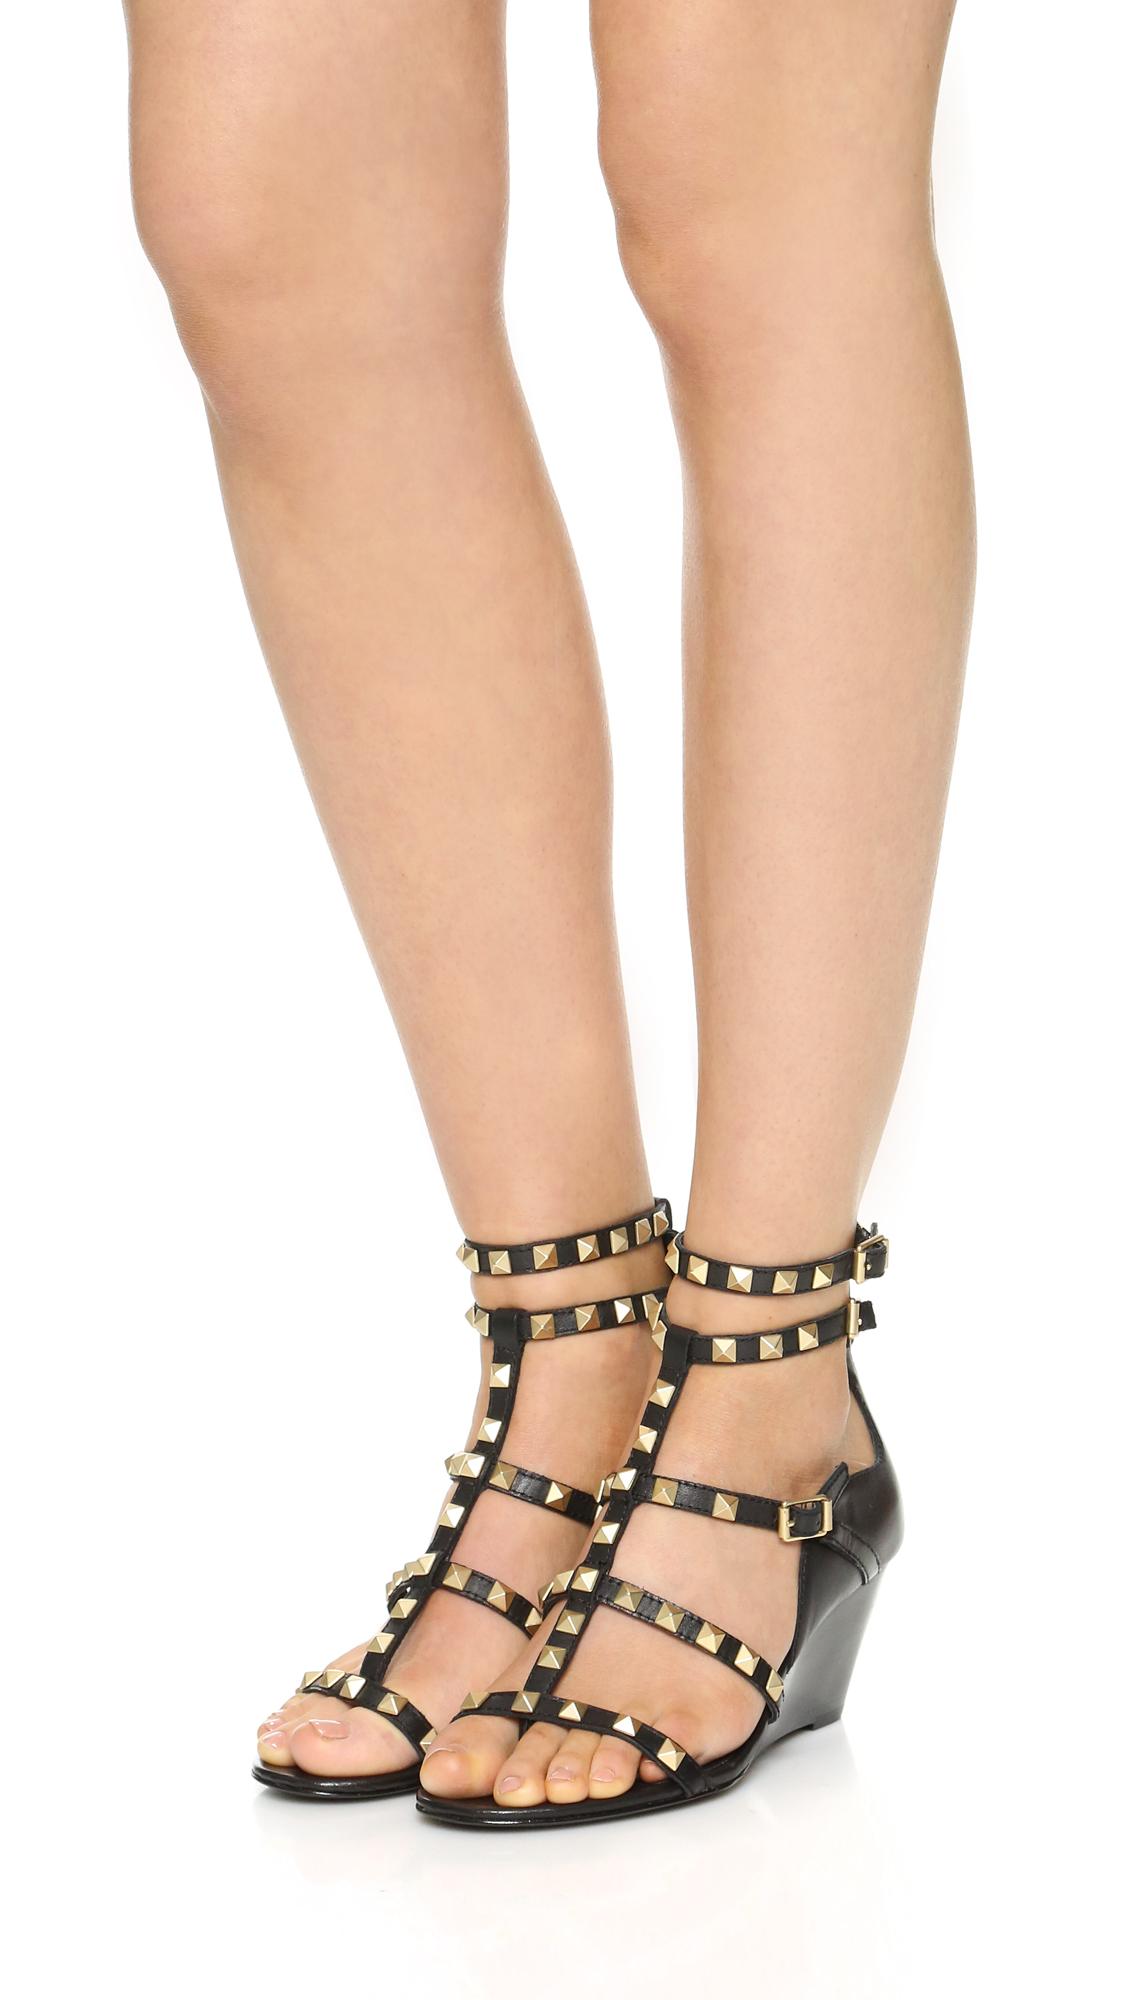 6cfcfa302d6b Ash Dafne Wedge Sandals